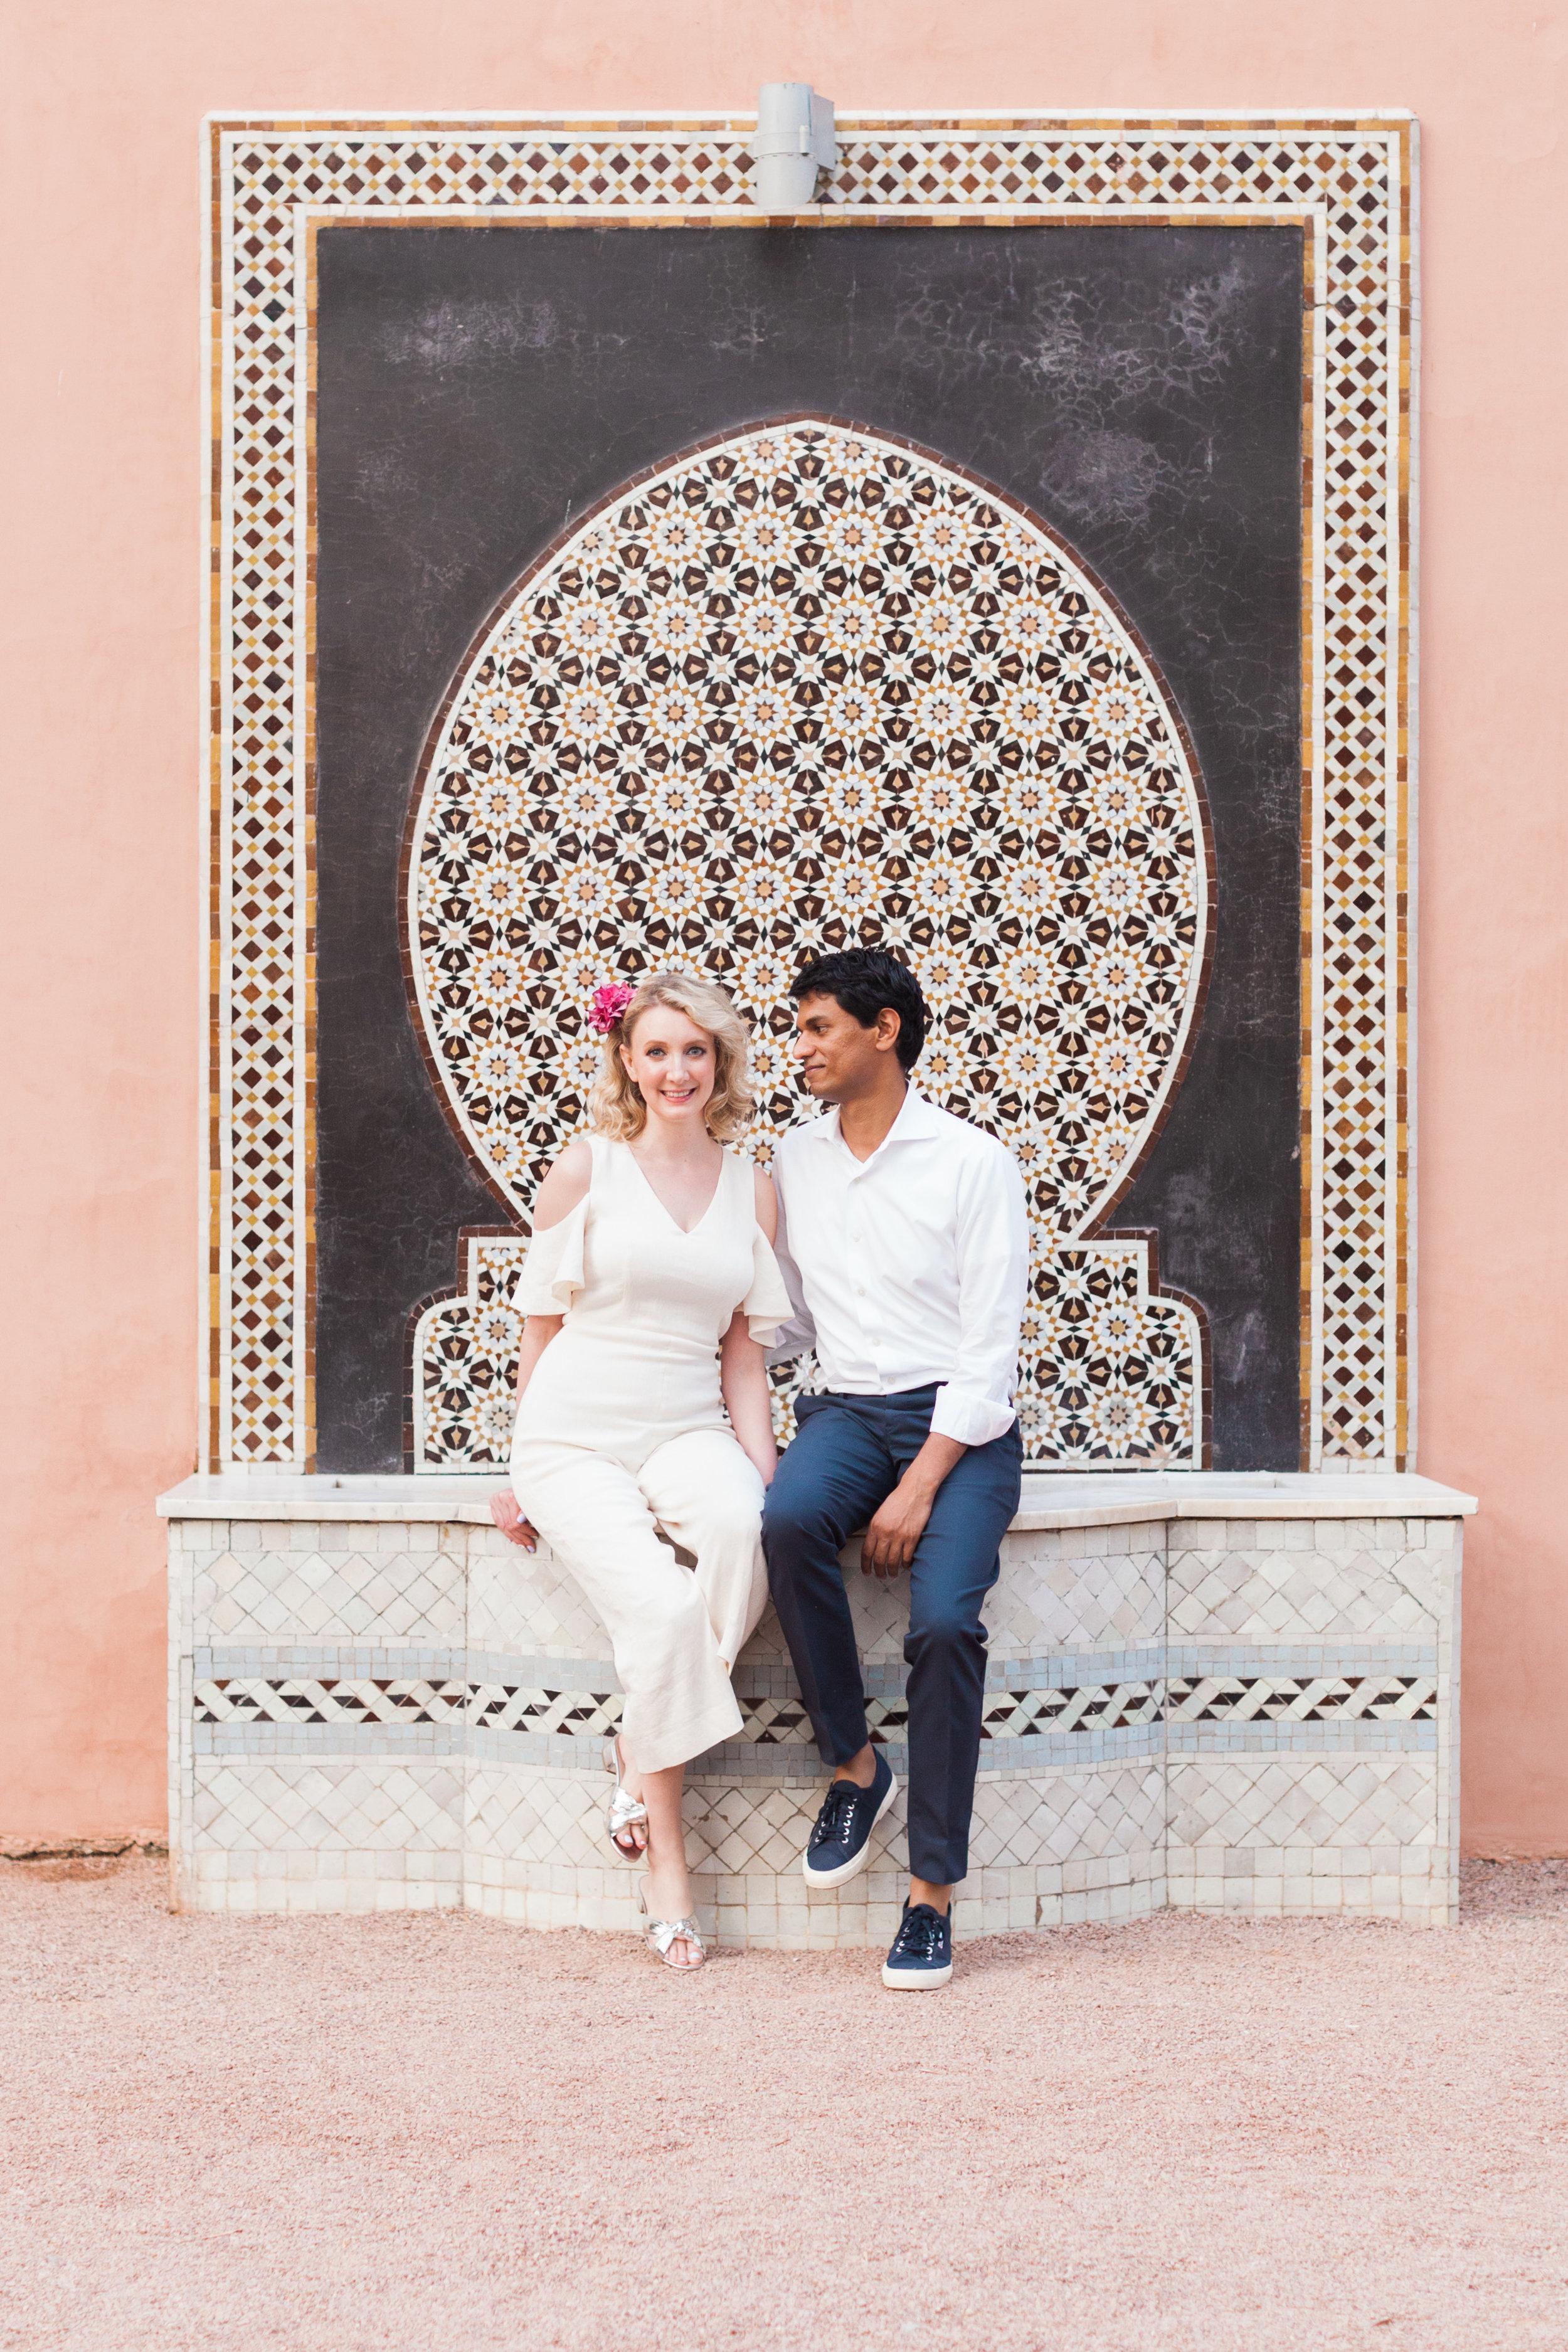 maria-rao-photography-la-mamounia-marrakesh-morocco-10.jpg